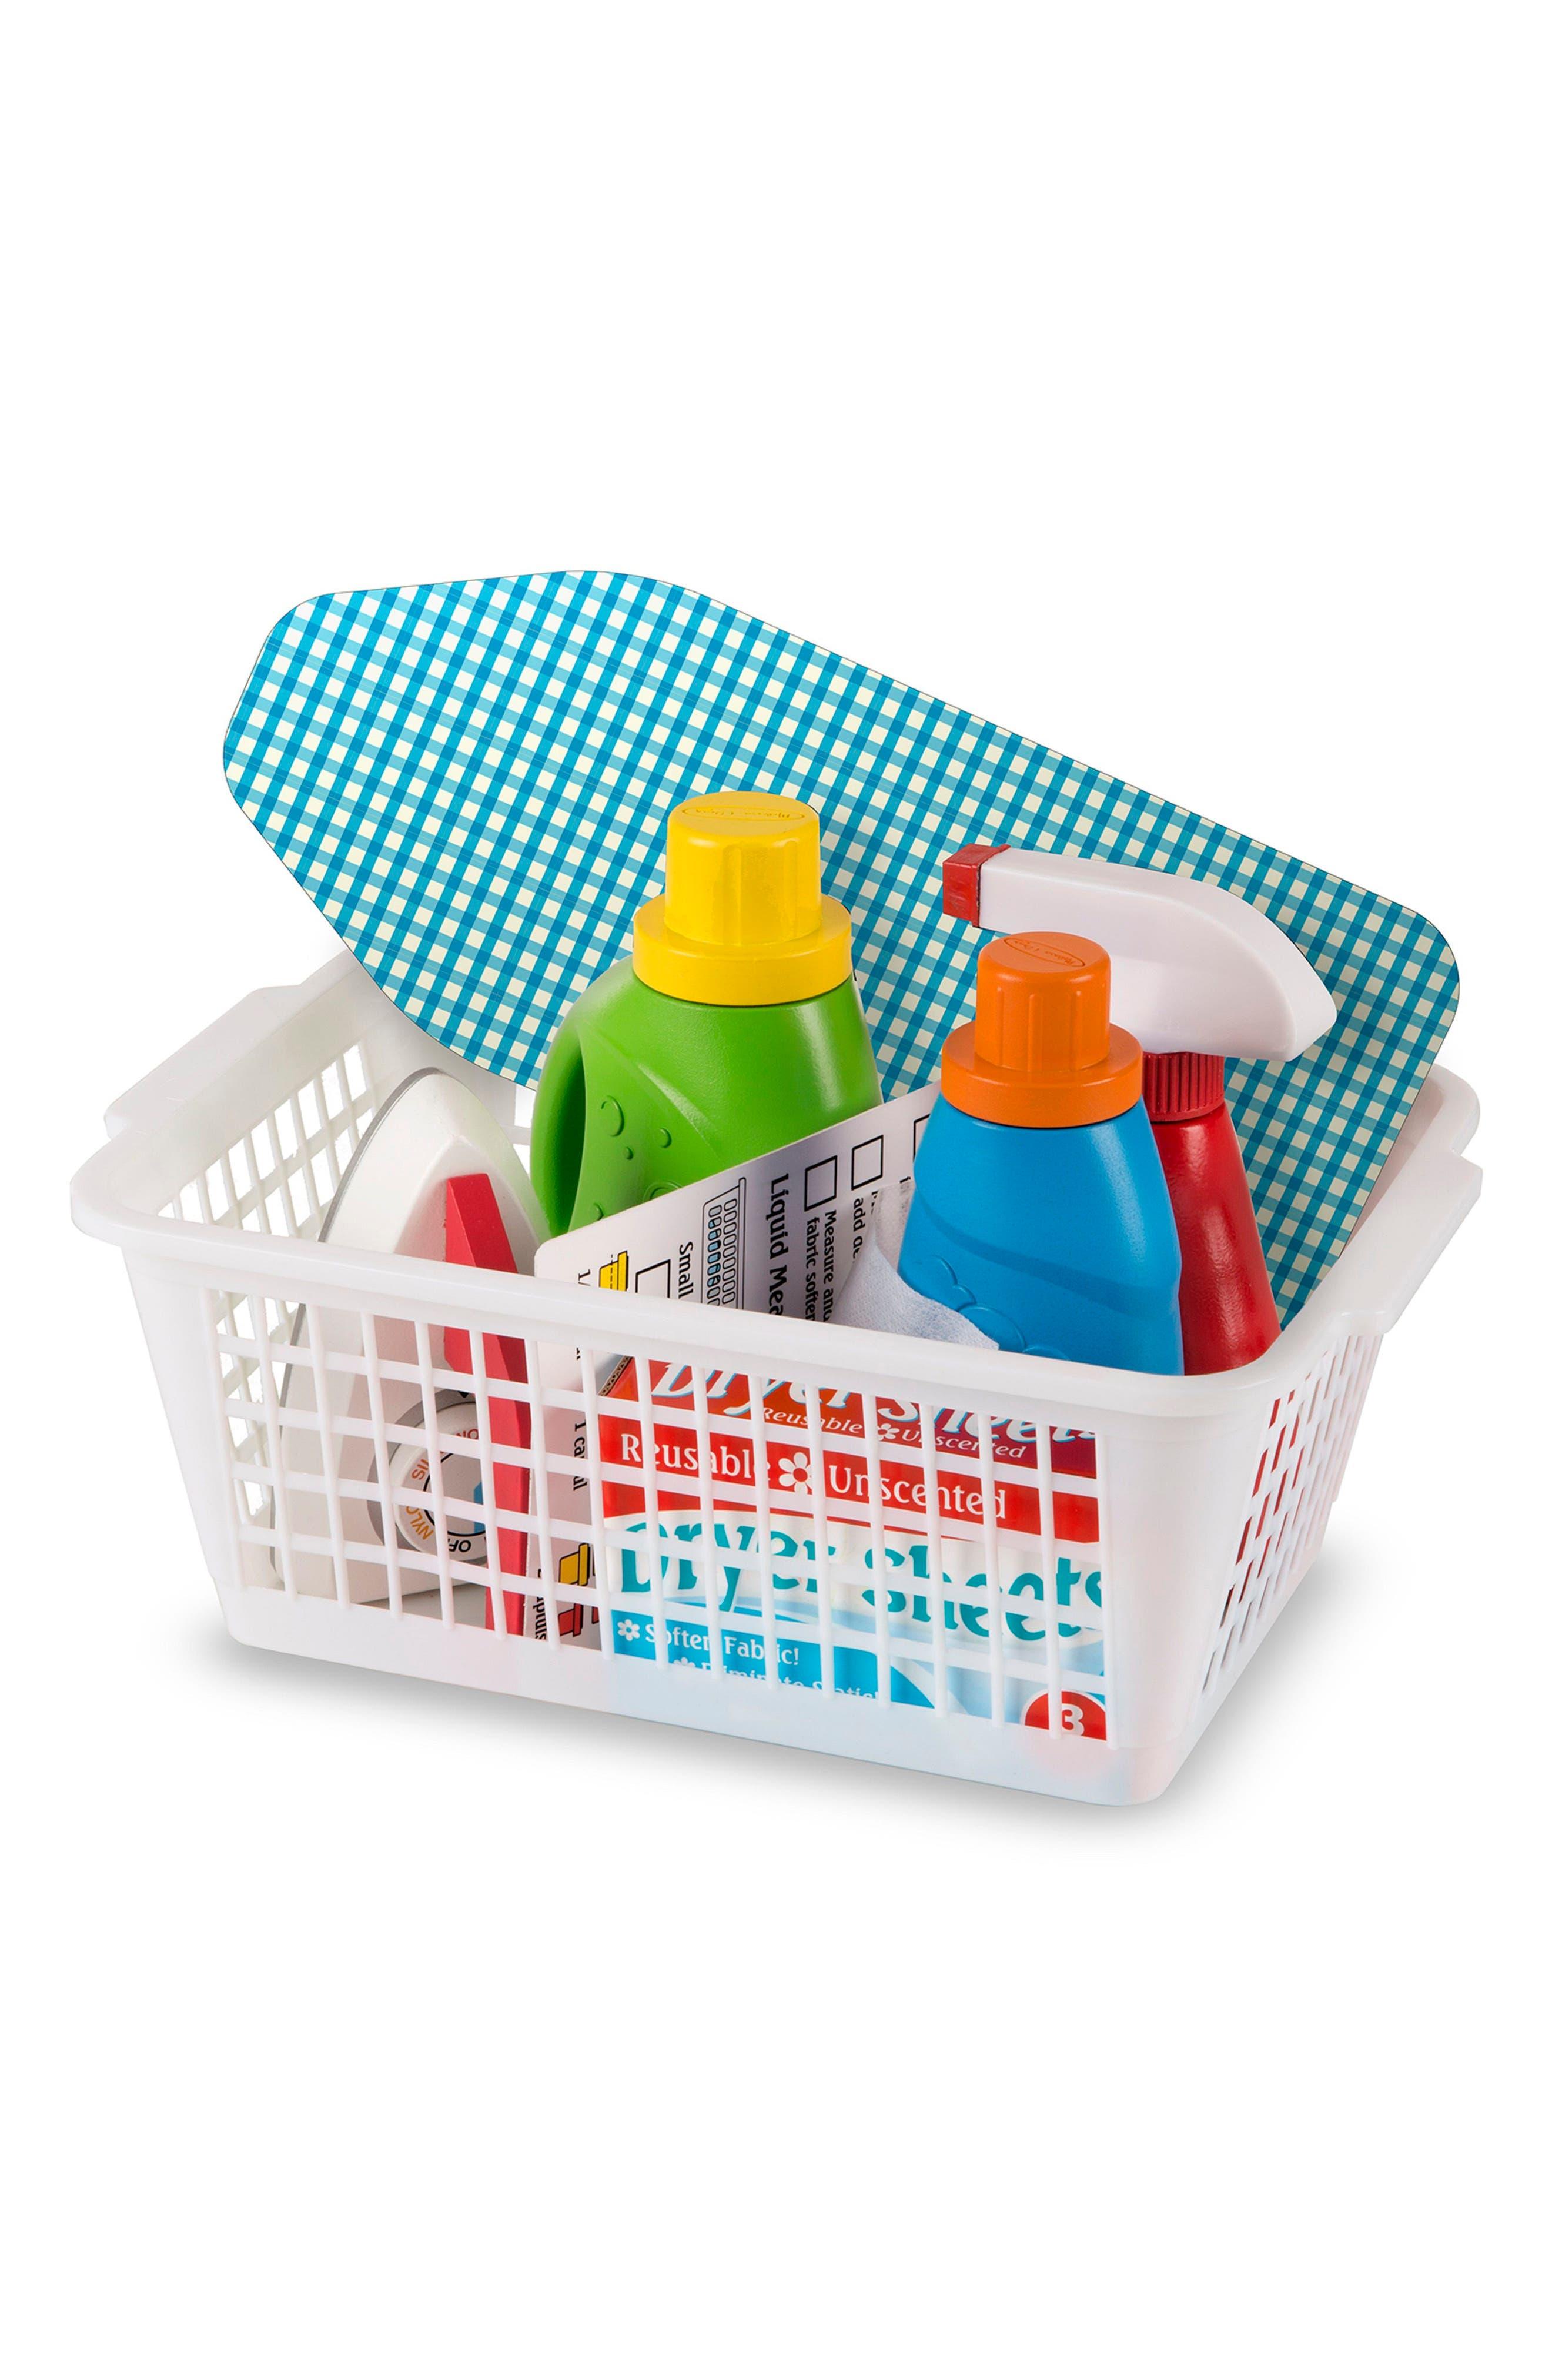 11-Piece Laundry Basket Play Set,                             Alternate thumbnail 3, color,                             MULTI